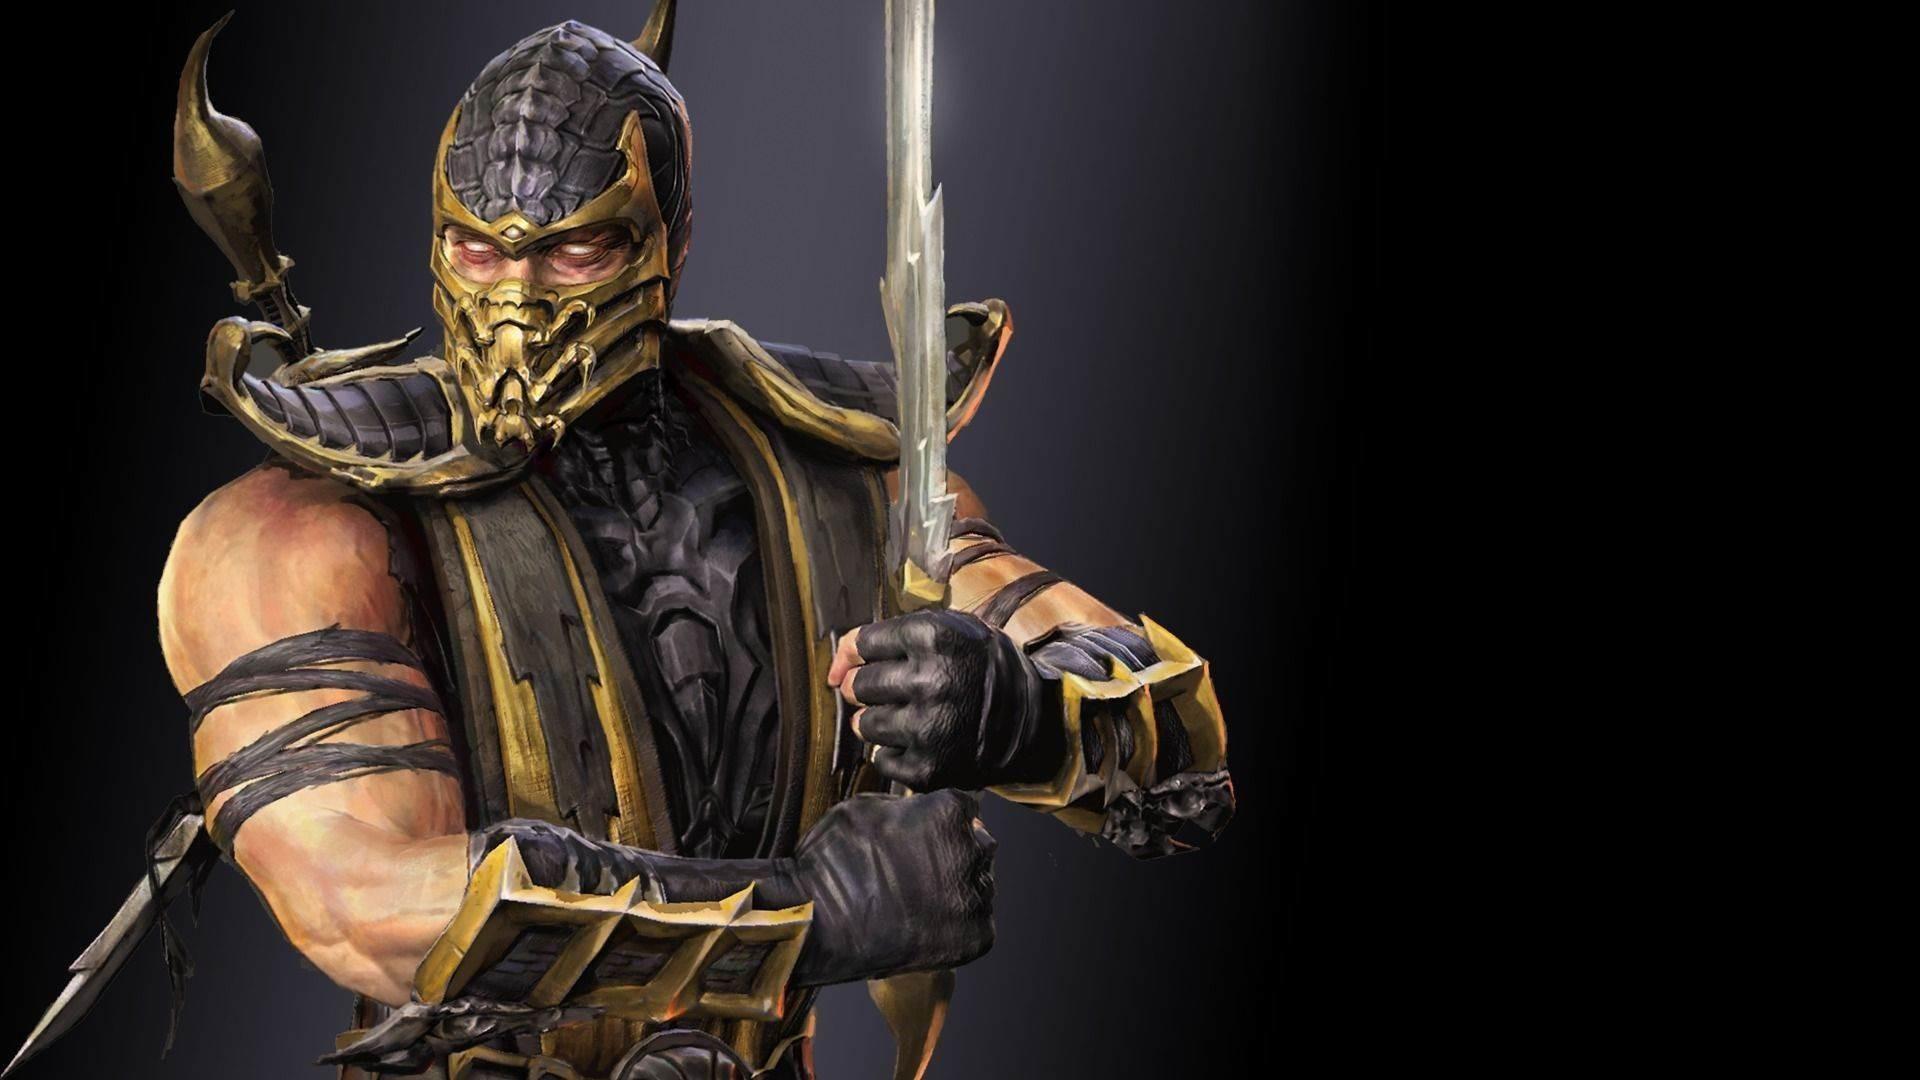 Scorpion Mortal Kombat, Mortal Kombat X, Backgrounds For Desktop, Salvador  Dali, Hd Wallpaper, Free Picture